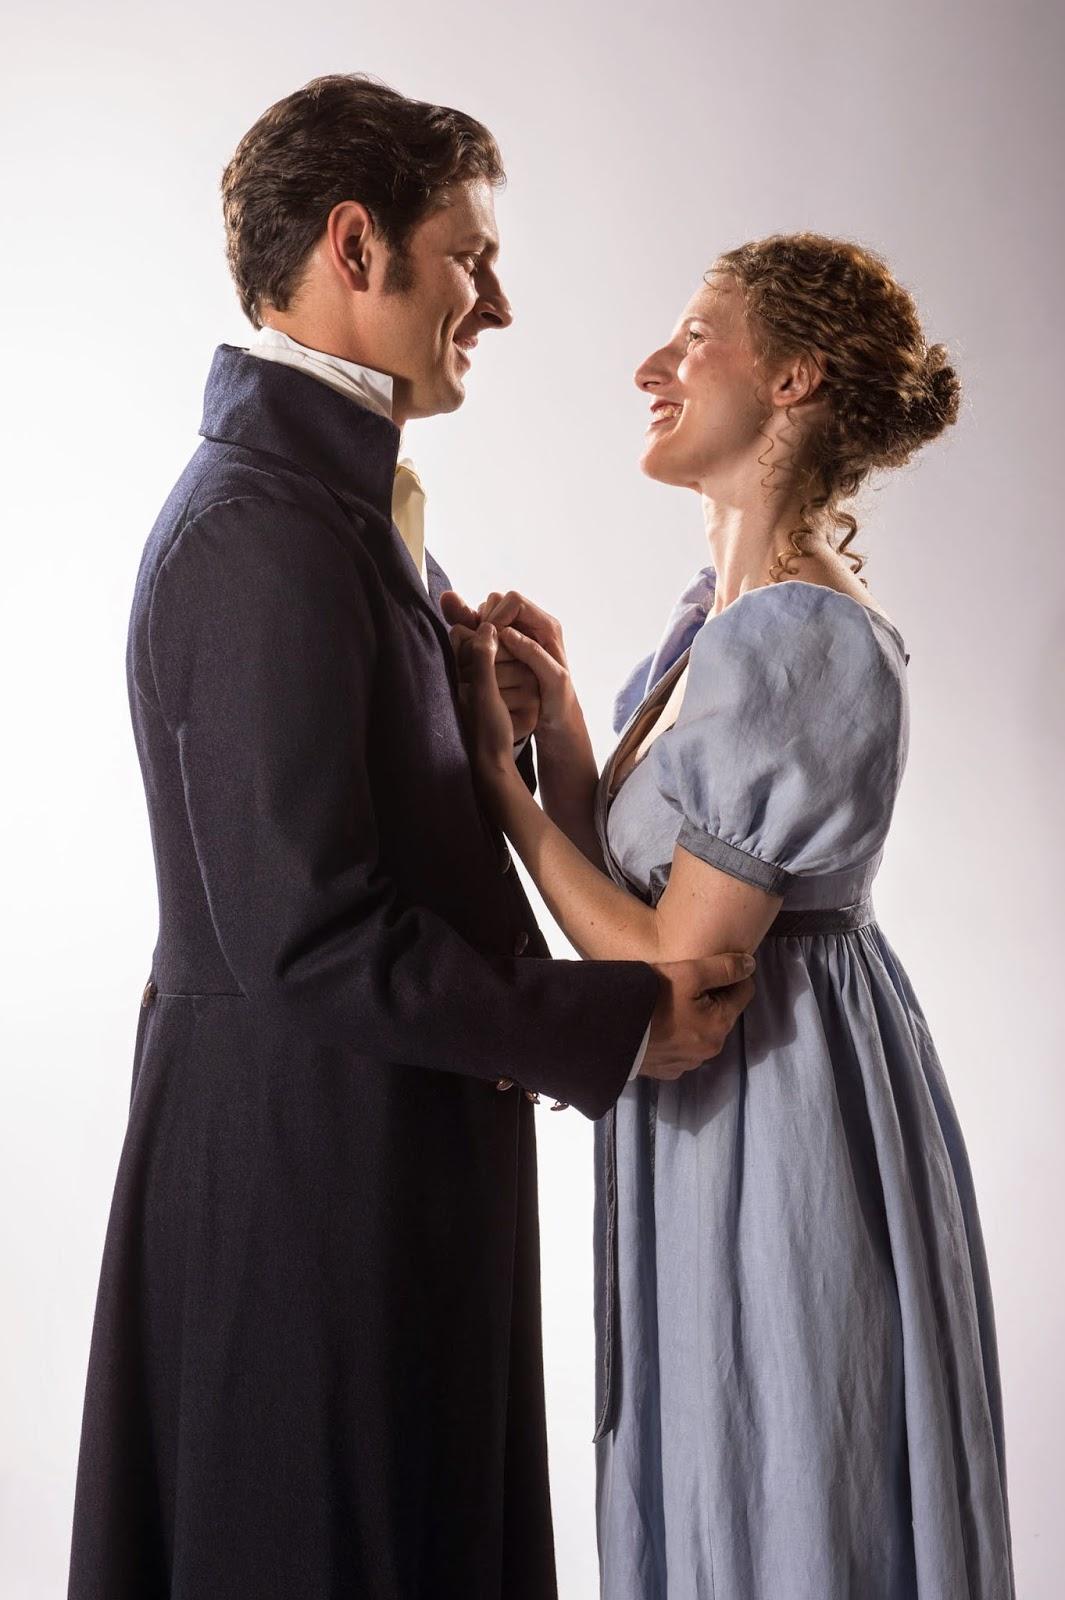 Mattfeld as Edward Ferrars,Bissell as Elinor Dashwood.Photoby Karl Hugh